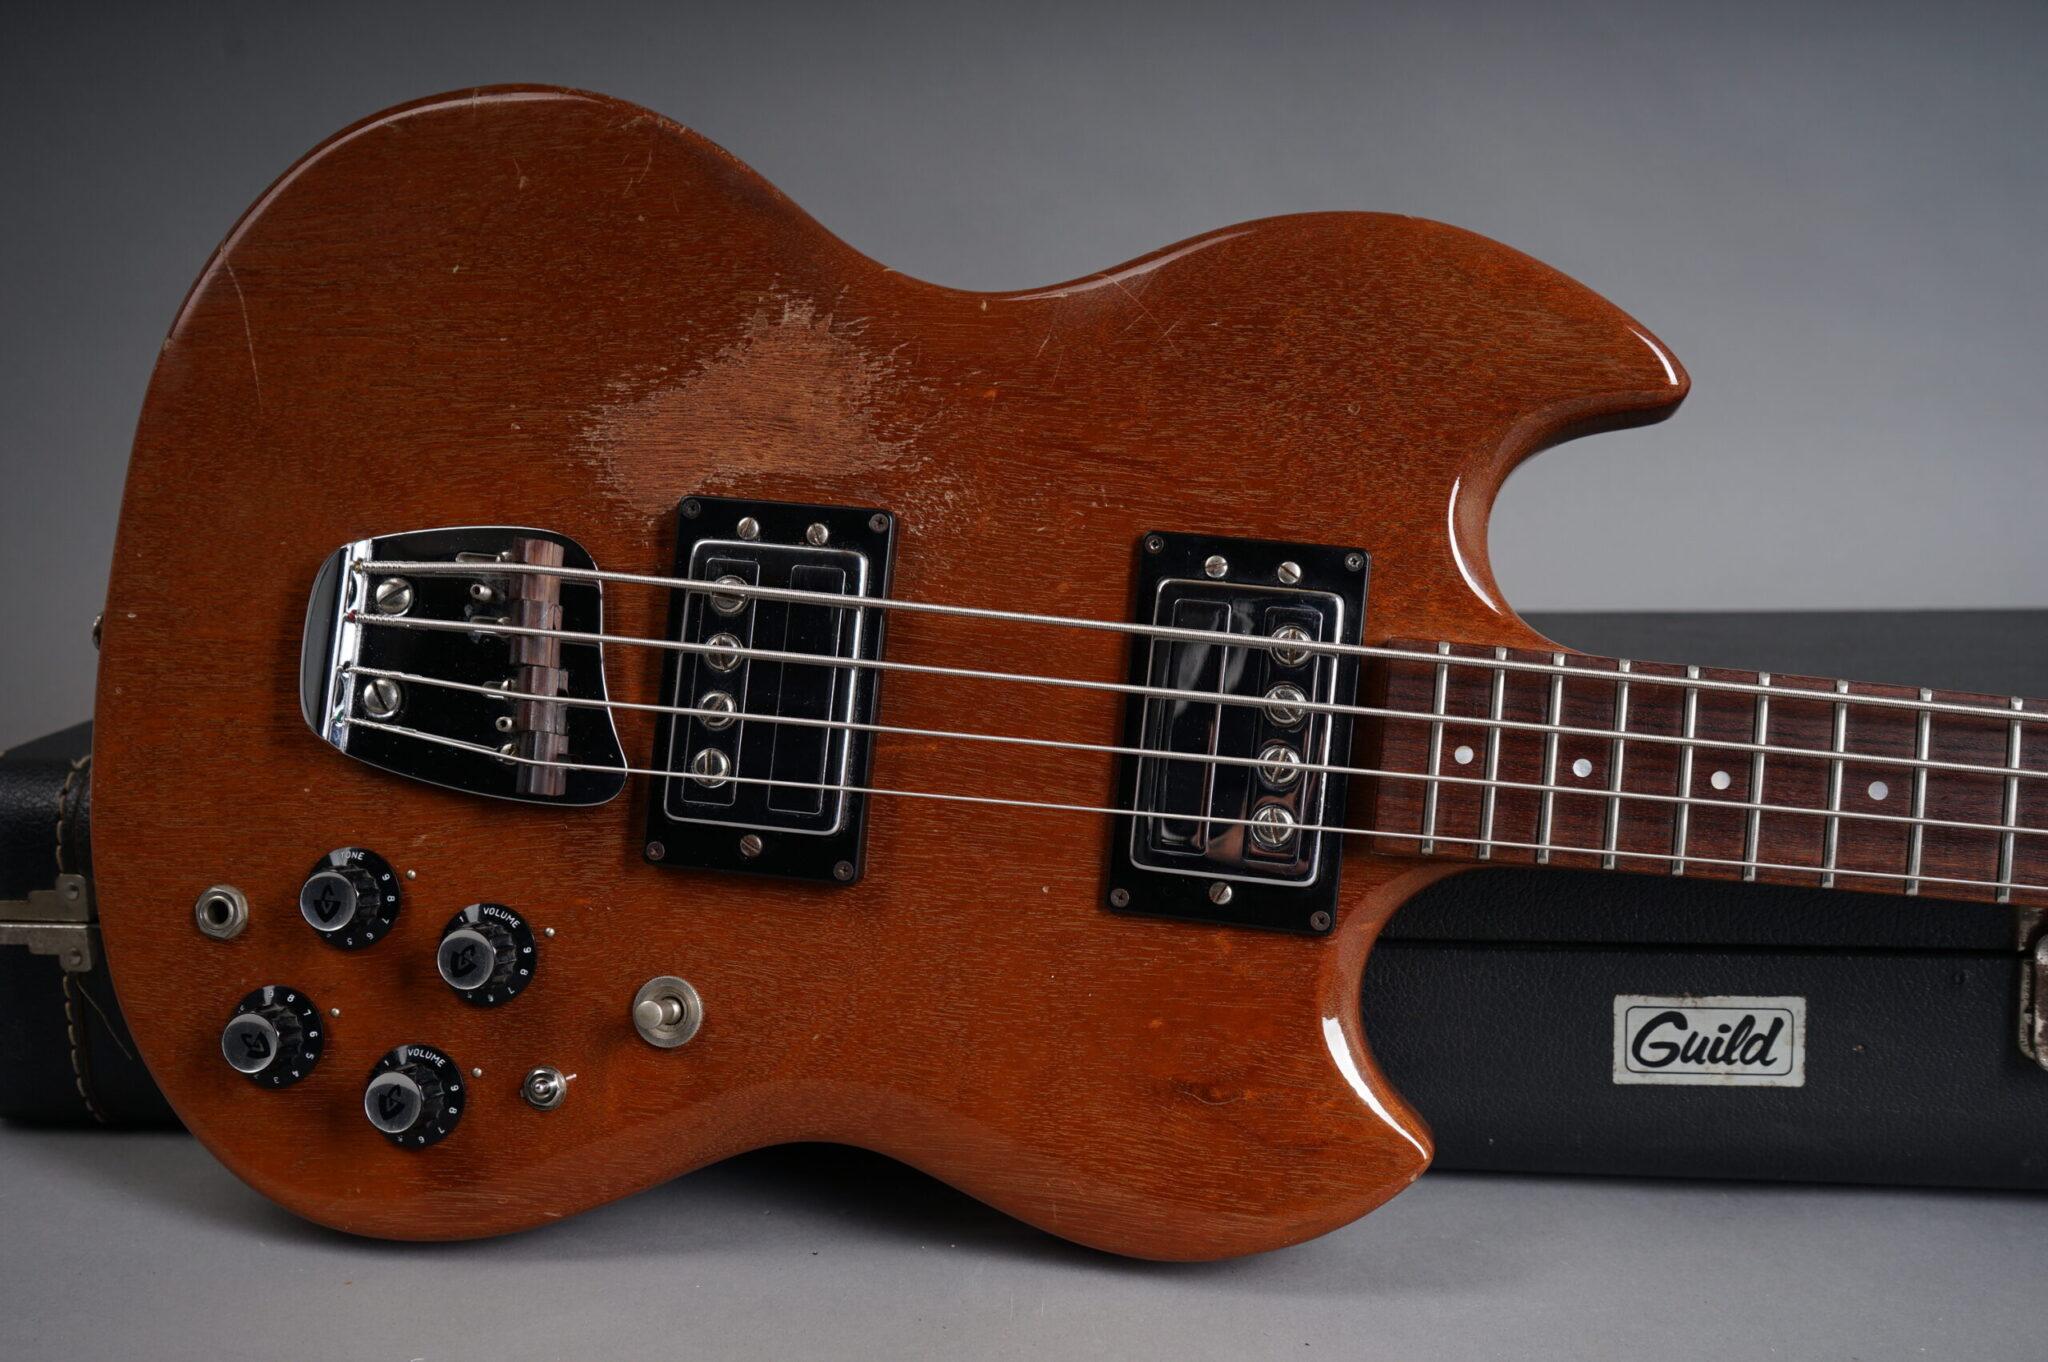 https://guitarpoint.de/app/uploads/products/1973-guild-jet-star-js-ii-bass-cherry/DSC07838-scaled-2048x1362.jpg